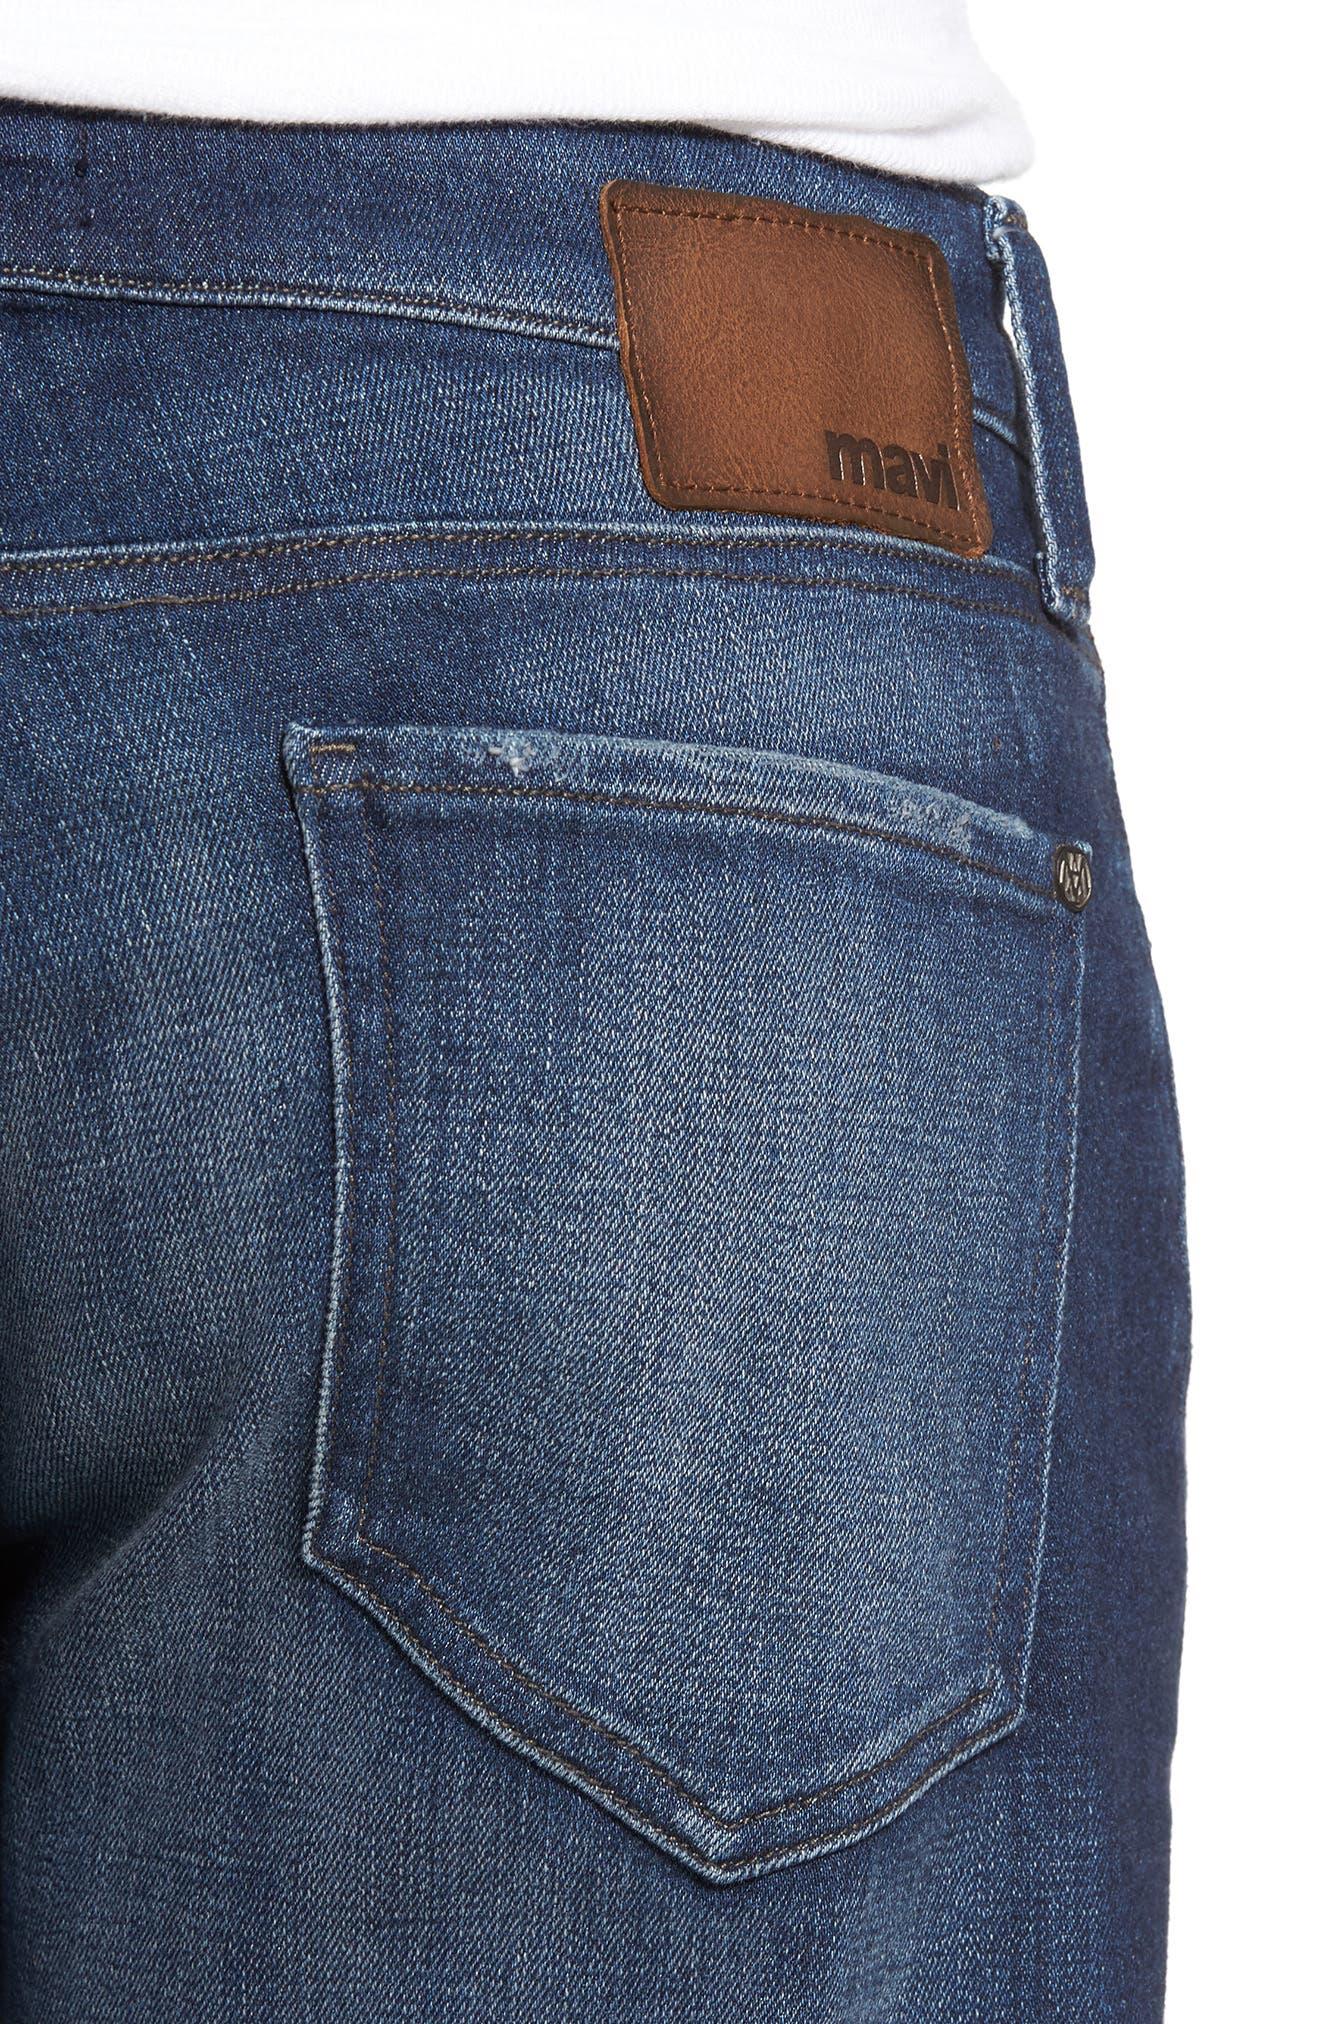 Zach Straight Leg Jeans,                             Alternate thumbnail 4, color,                             Dark Brooklyn